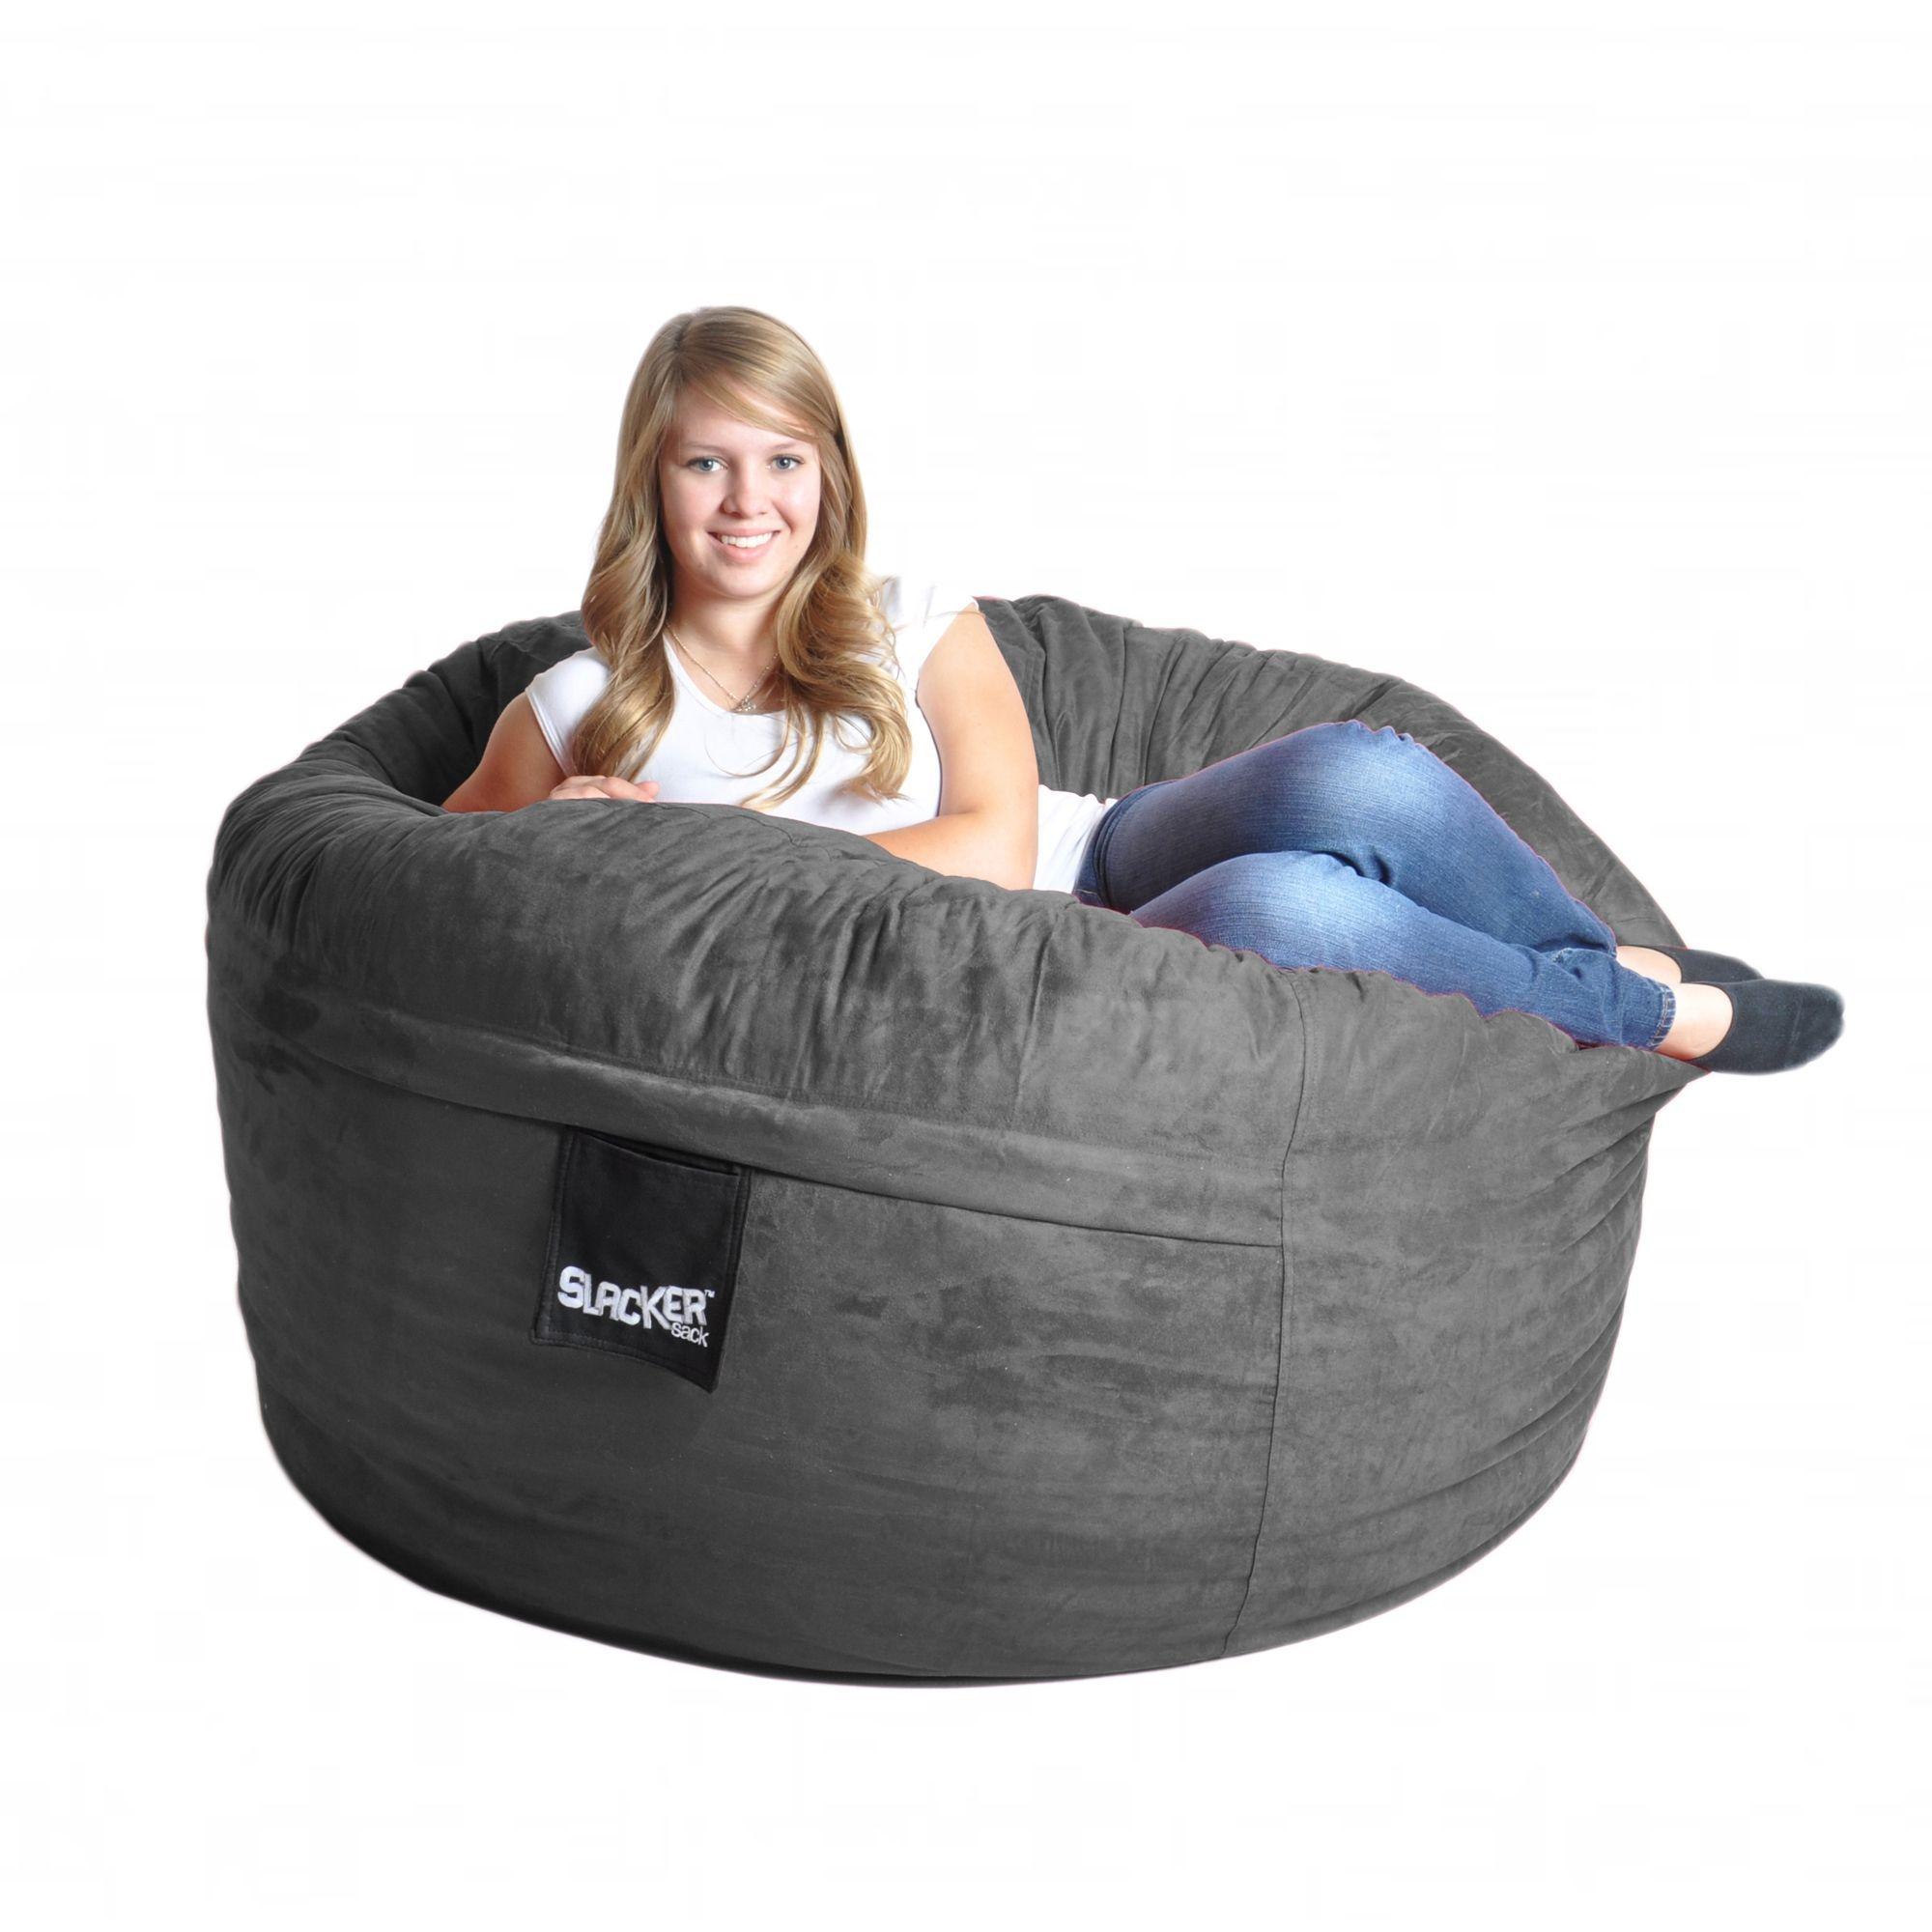 5u0027 Charcoal Grey Foam Bean Bag Chair Like LoveSac Gray Microsuede SLACKER  Sack Love Sack